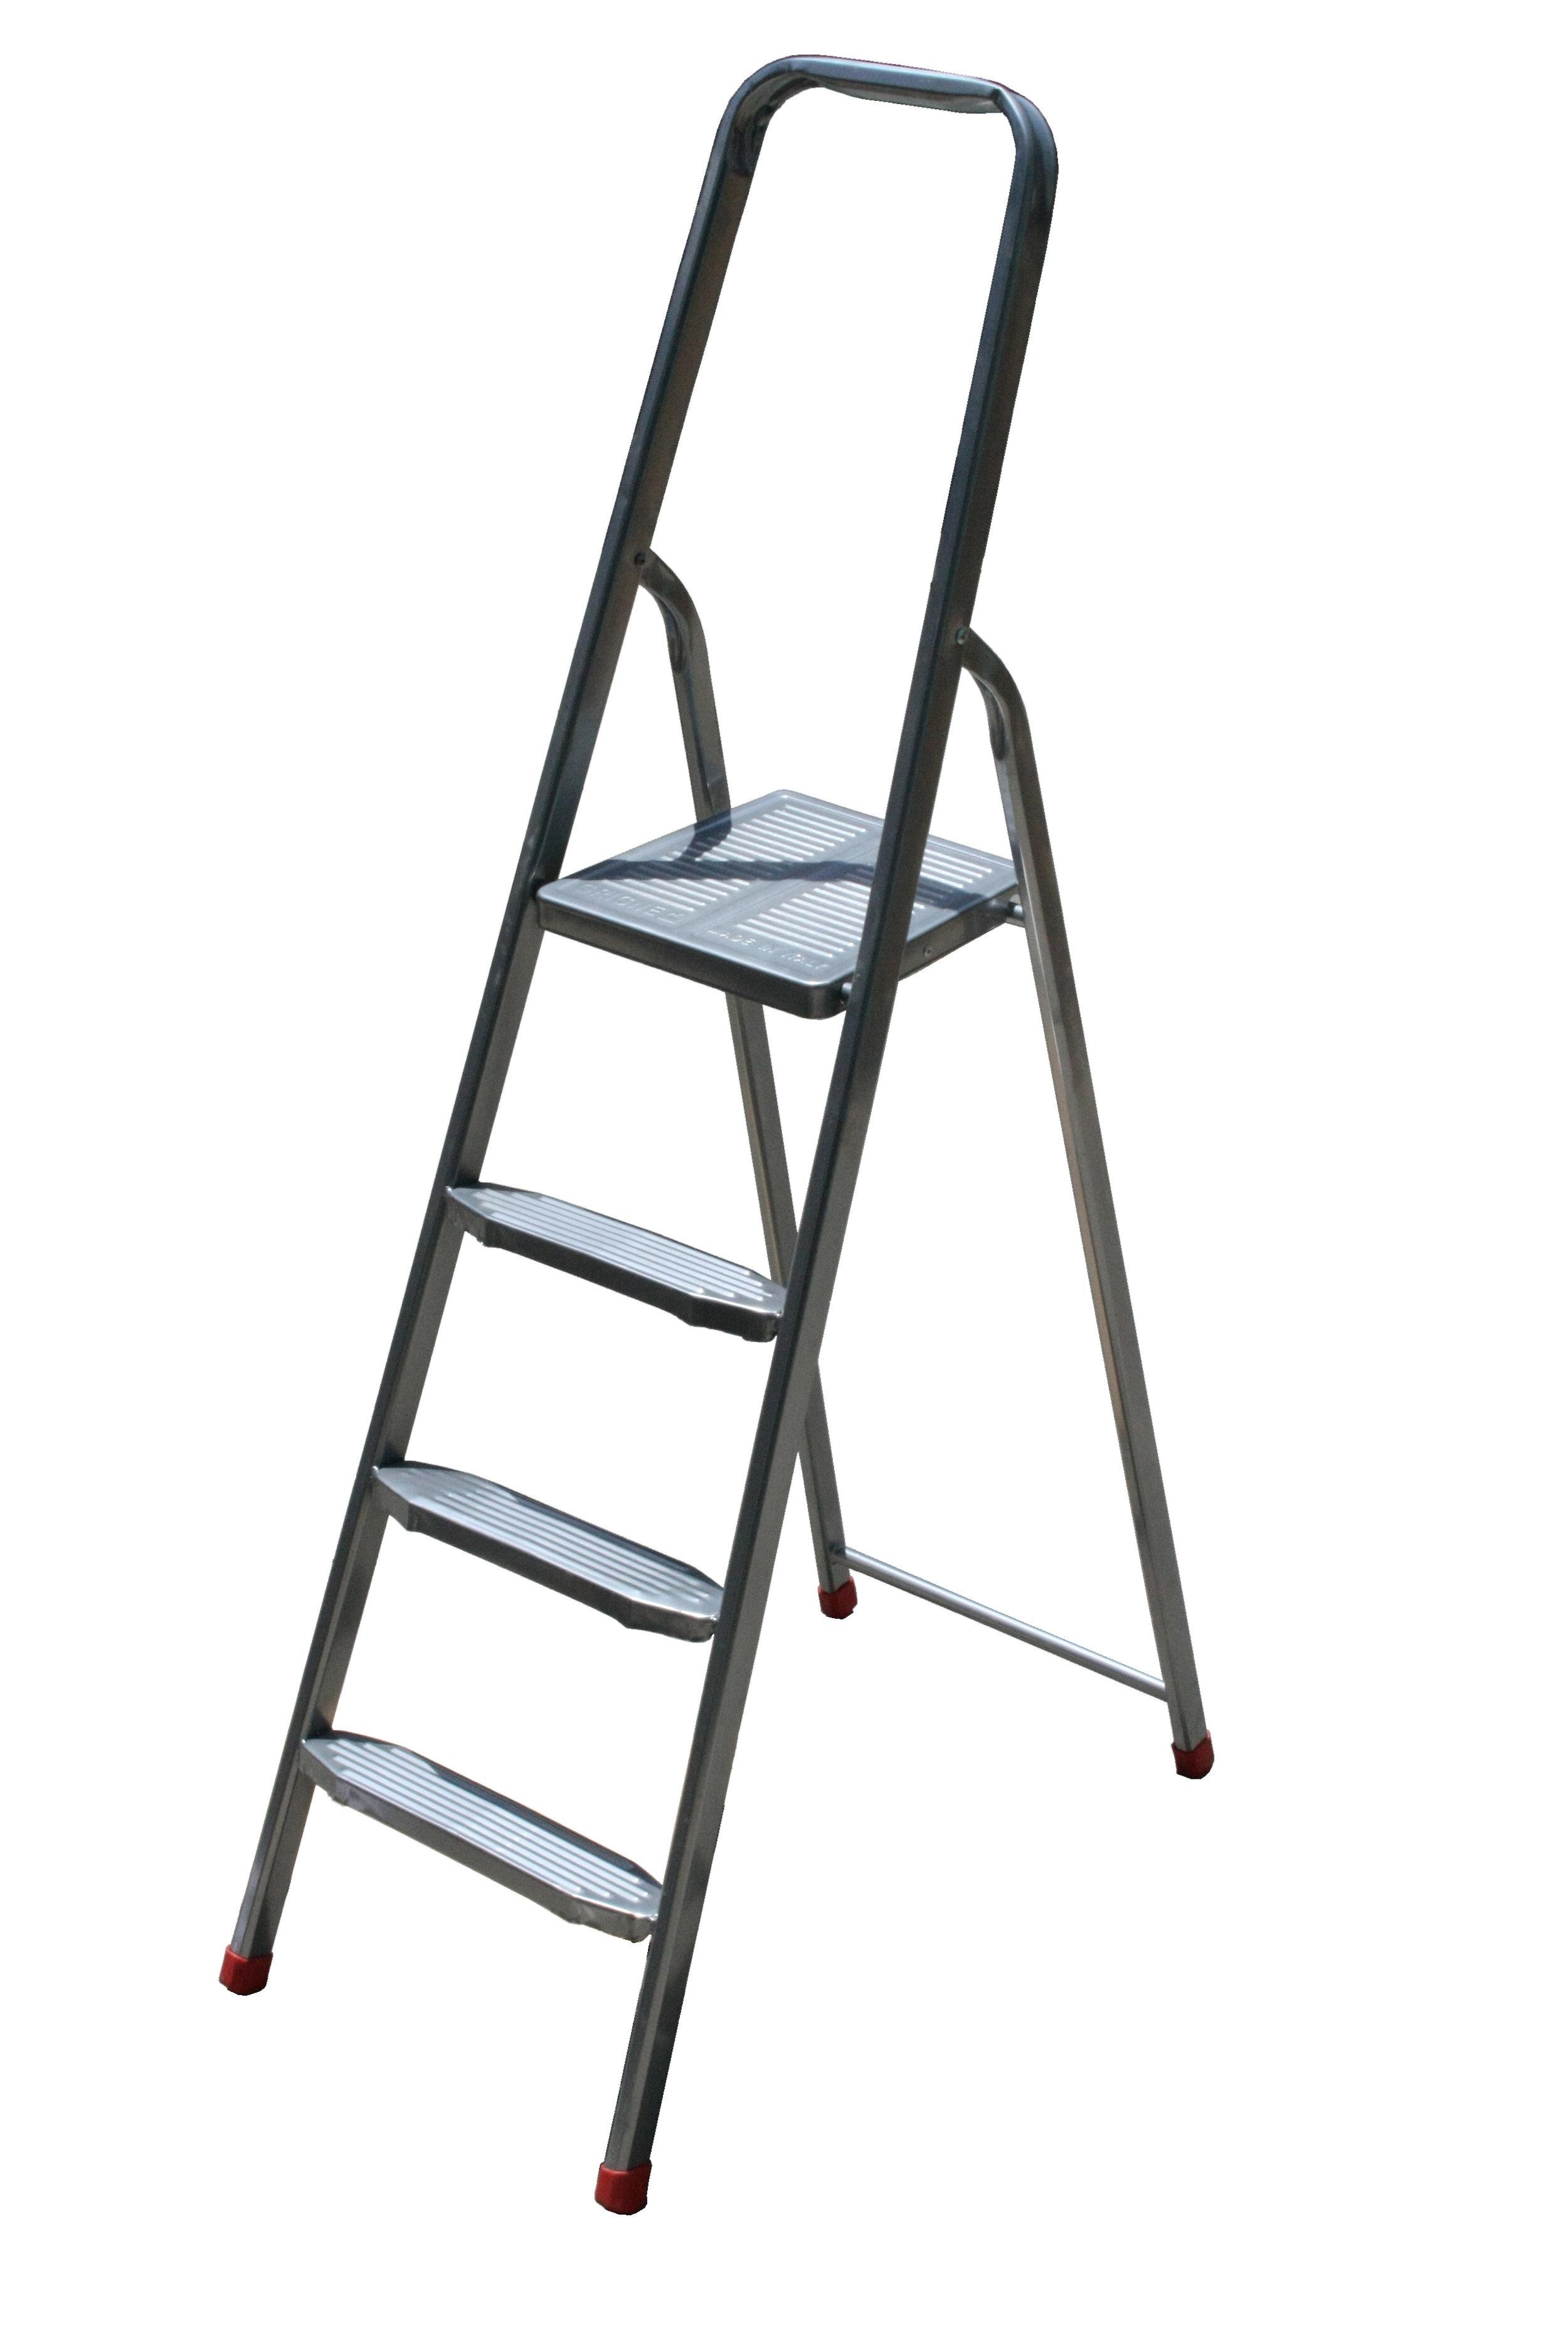 Steel ladder-4Steps.jpg